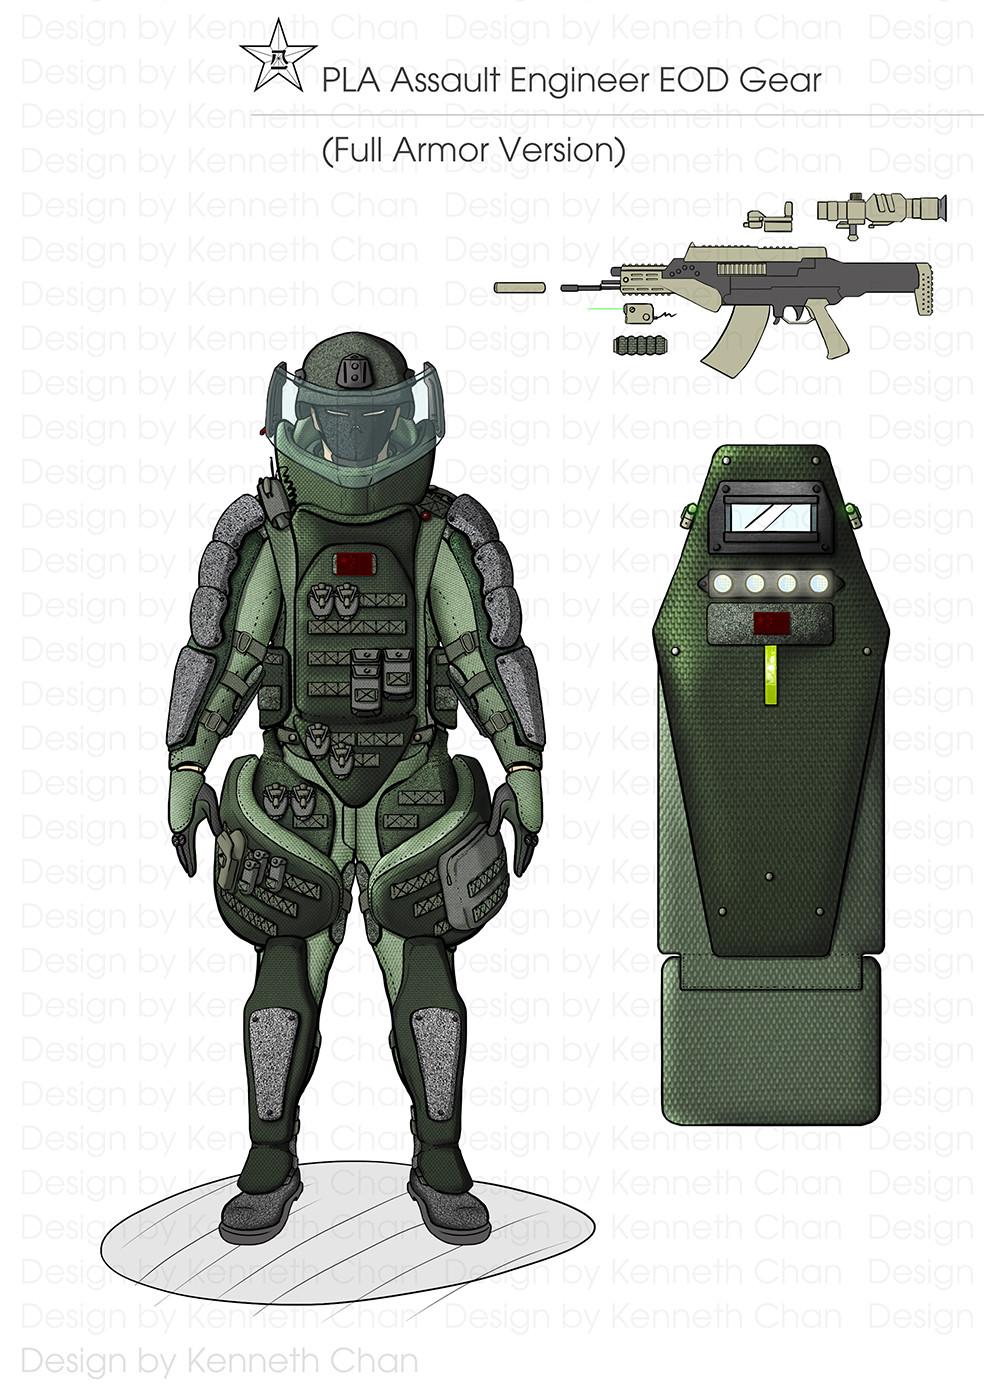 PLA Assault Engineers EOD Gear  Full Armor Version Gear(Heavy Assault Shield Soldiers) (Heavy Assault Shield & QBZ11 OICW)